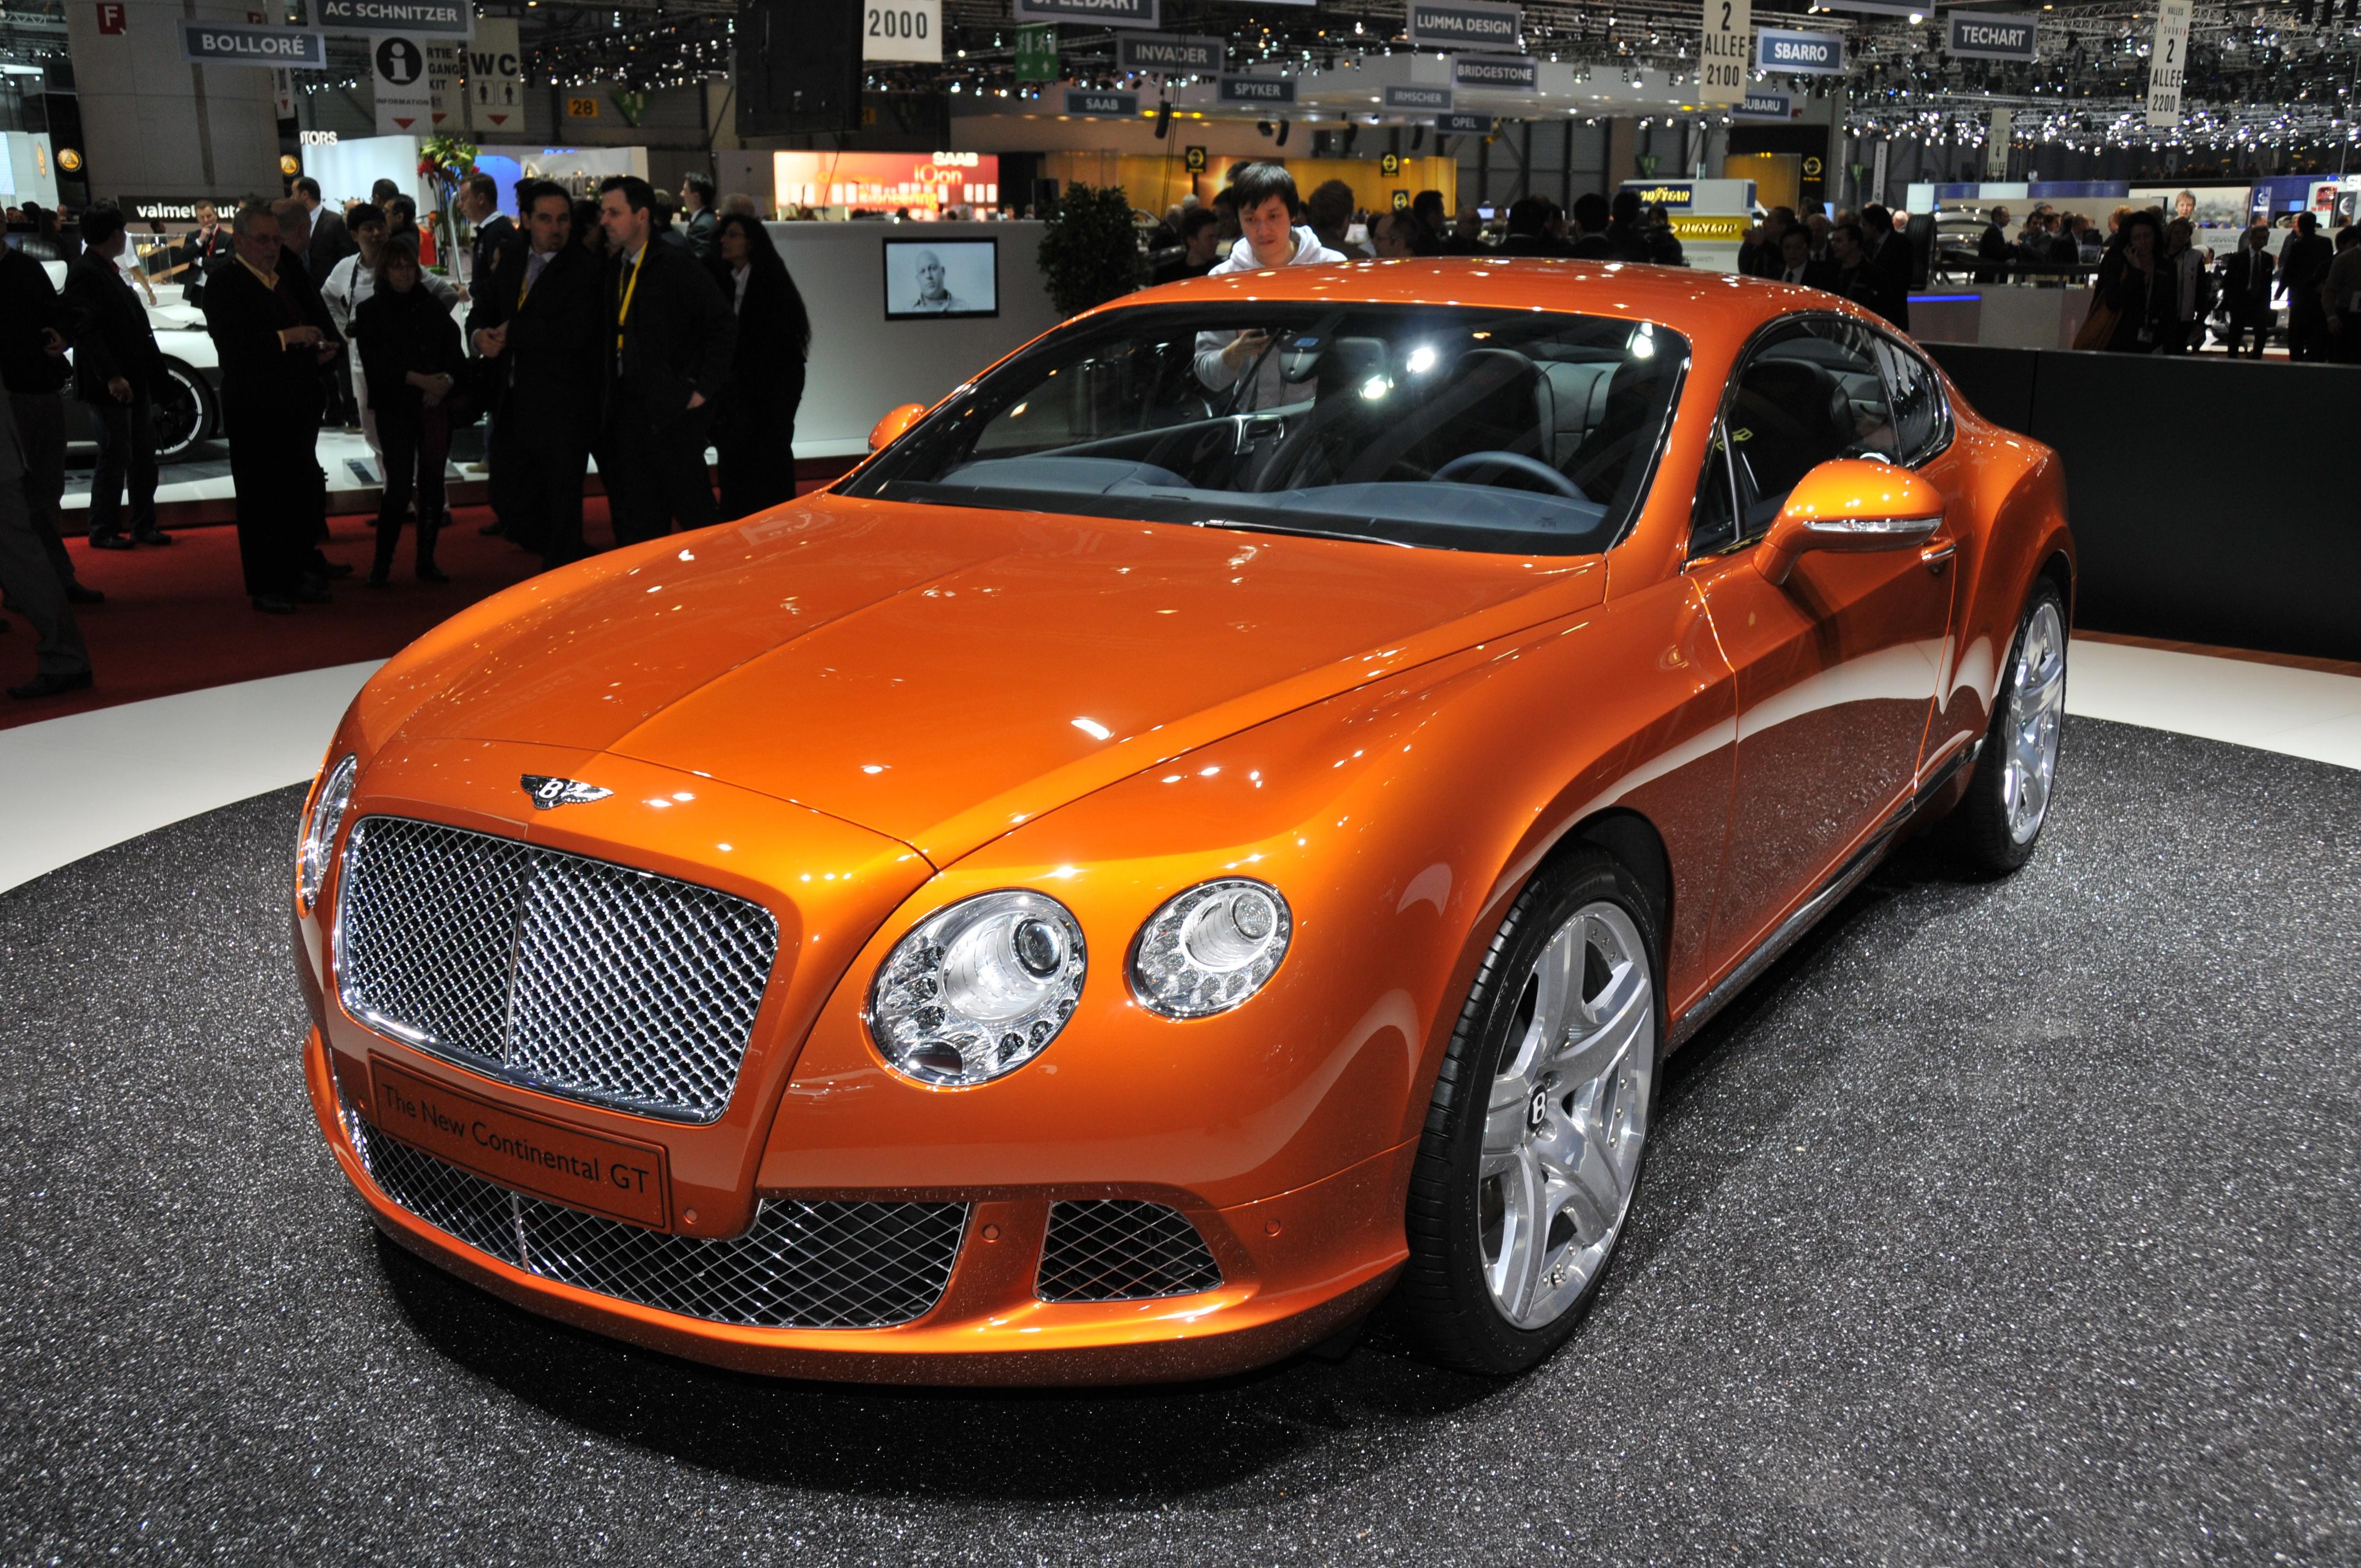 FileThe new Bentley Continental GT 5546164893jpg  Wikimedia